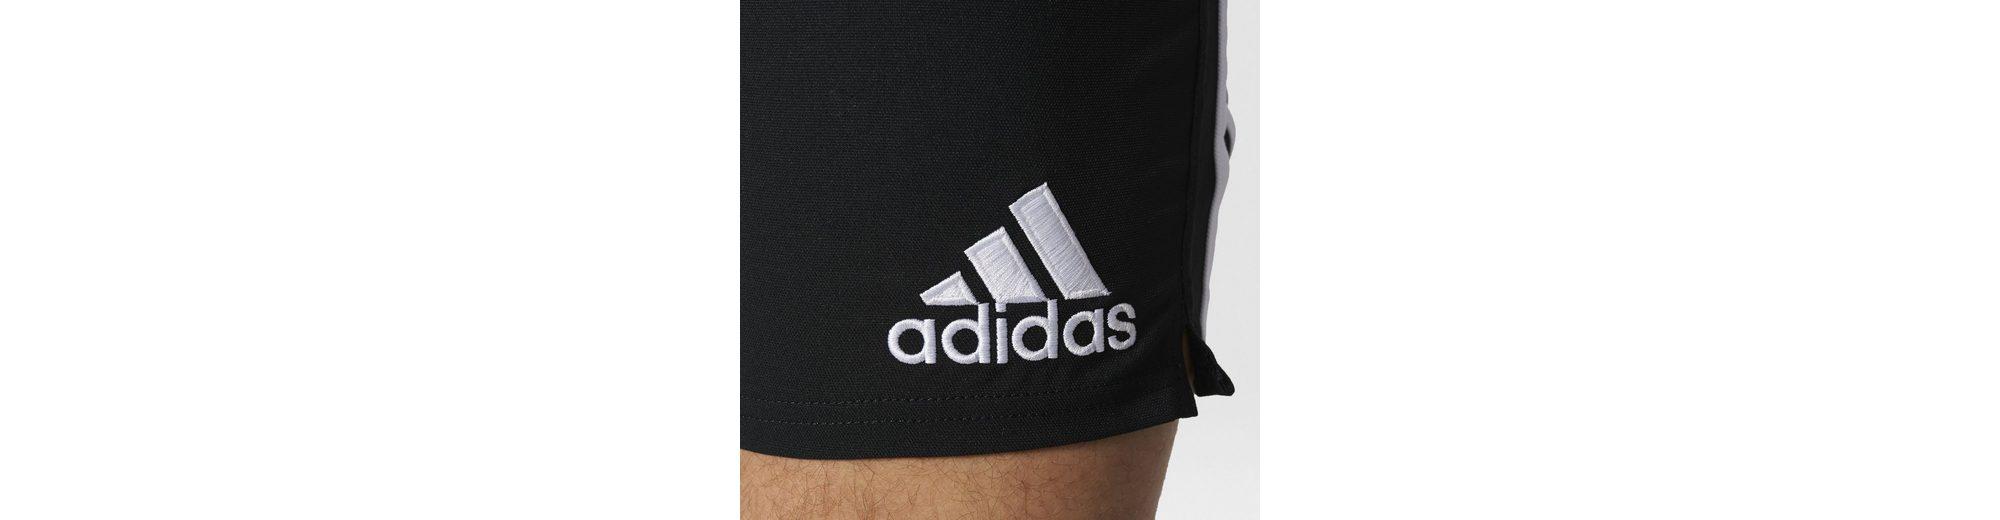 streifen Adidas 3 Shorts Performance Rugbyshorts Classic Ux8Iq7